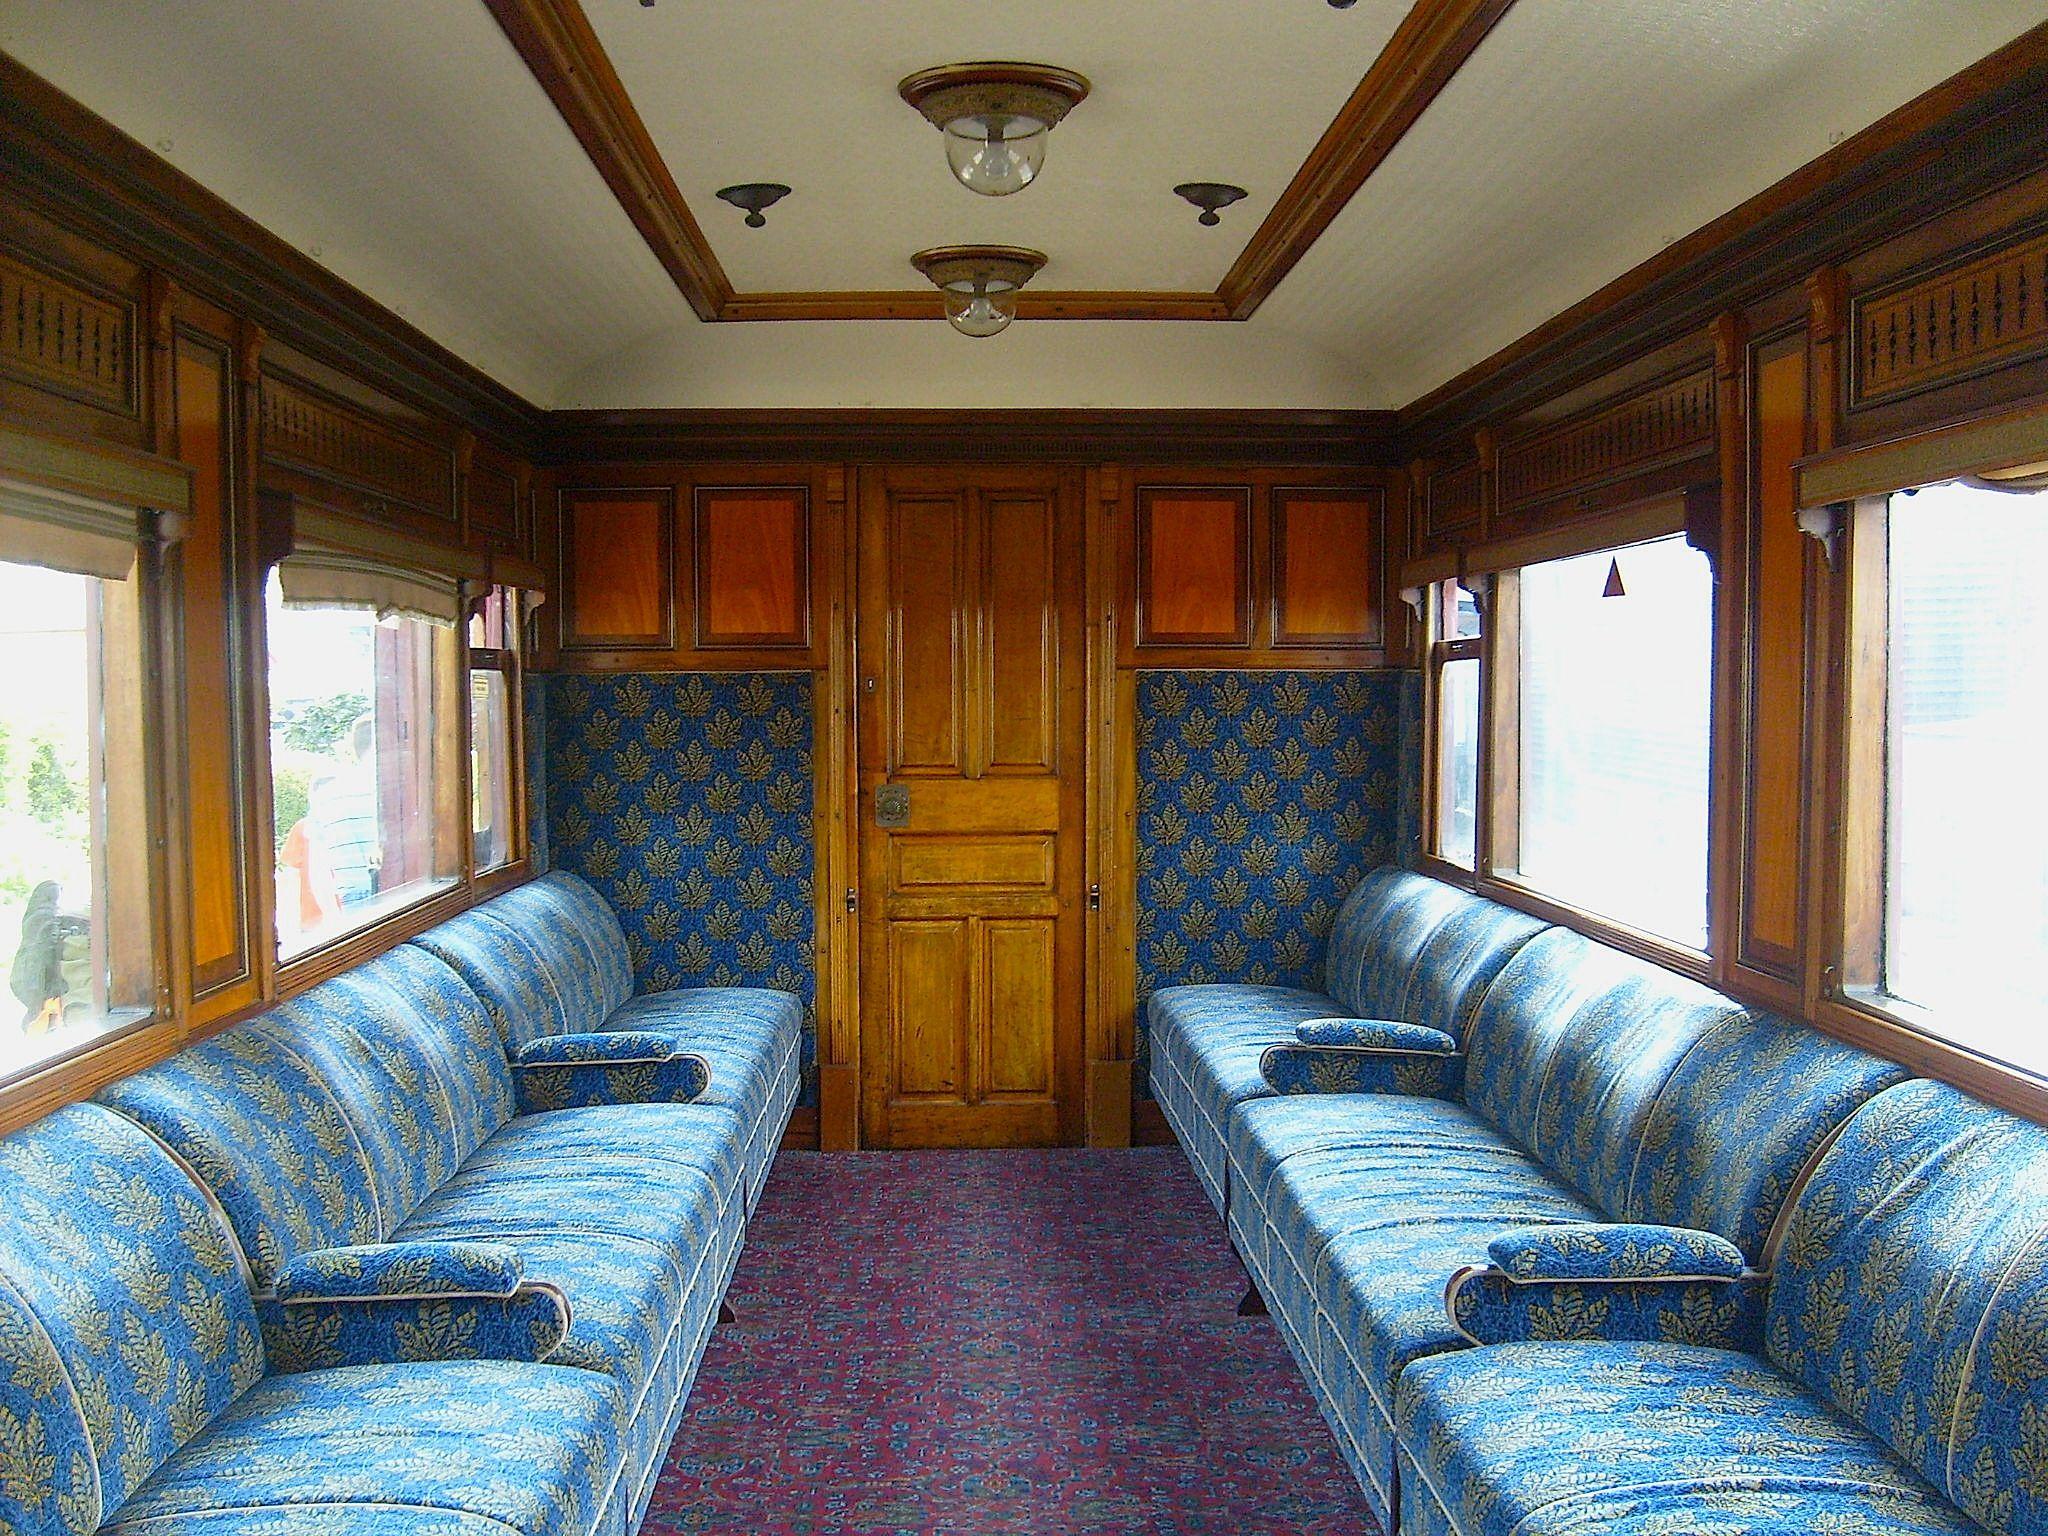 vintage railway carriage interior Google Search